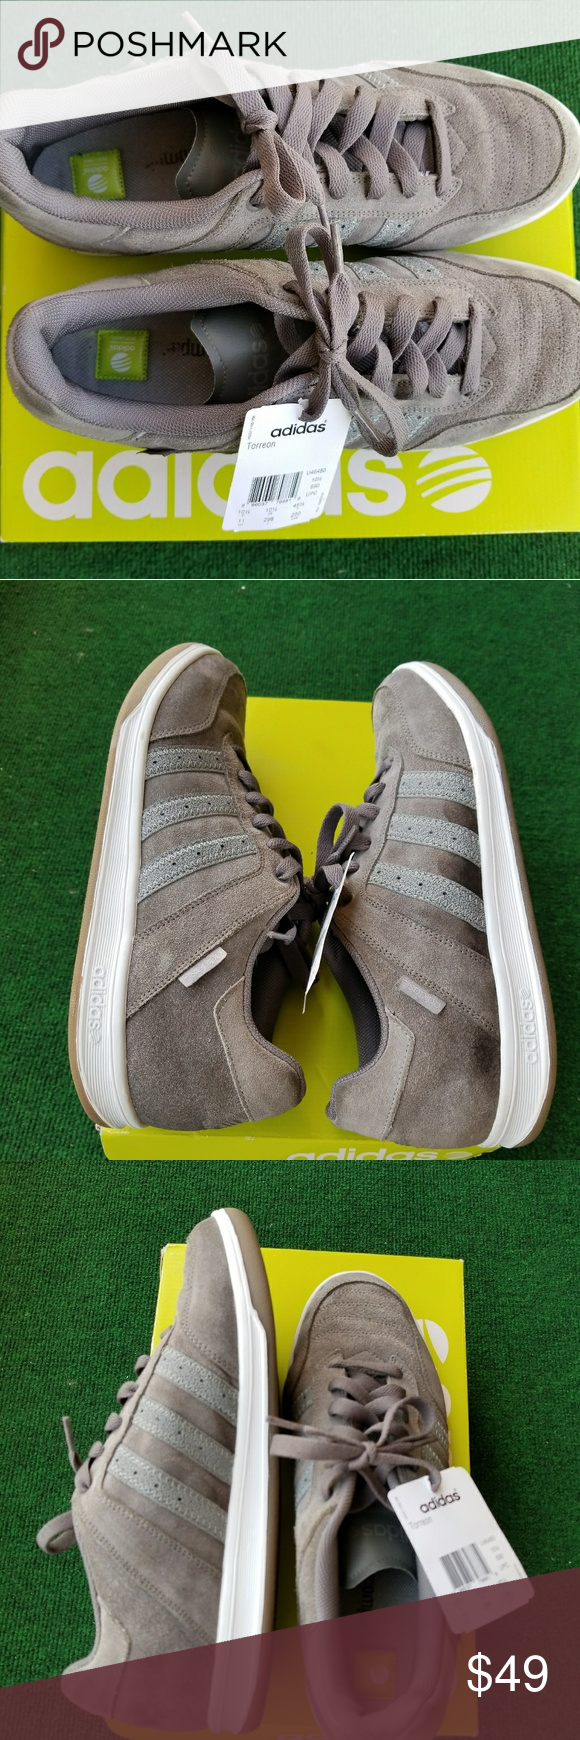 Pin de Karla Gup em sneakers ❤ | Adidas nmd r1, Adidas nmd